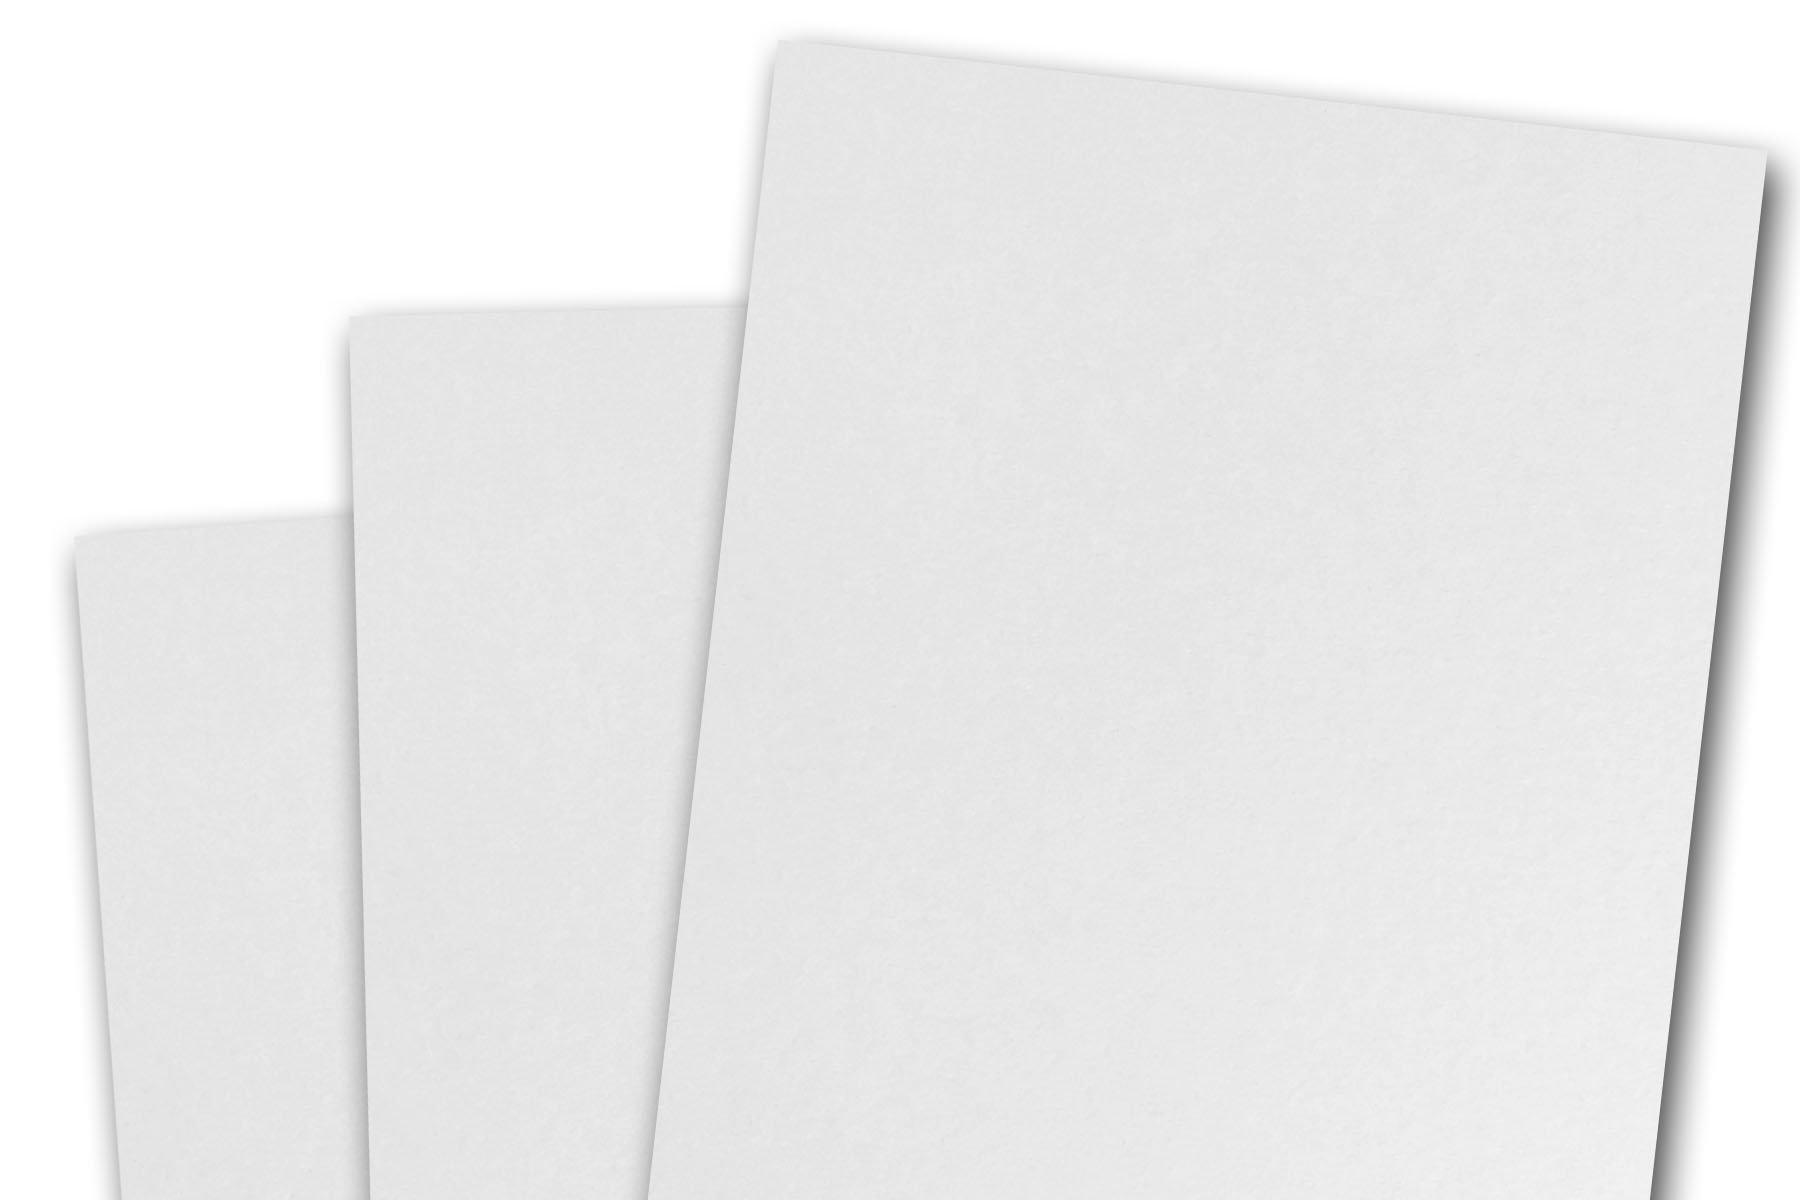 Blank 80# A7 Basic 5x7 Card Stock (250 Pack, White)